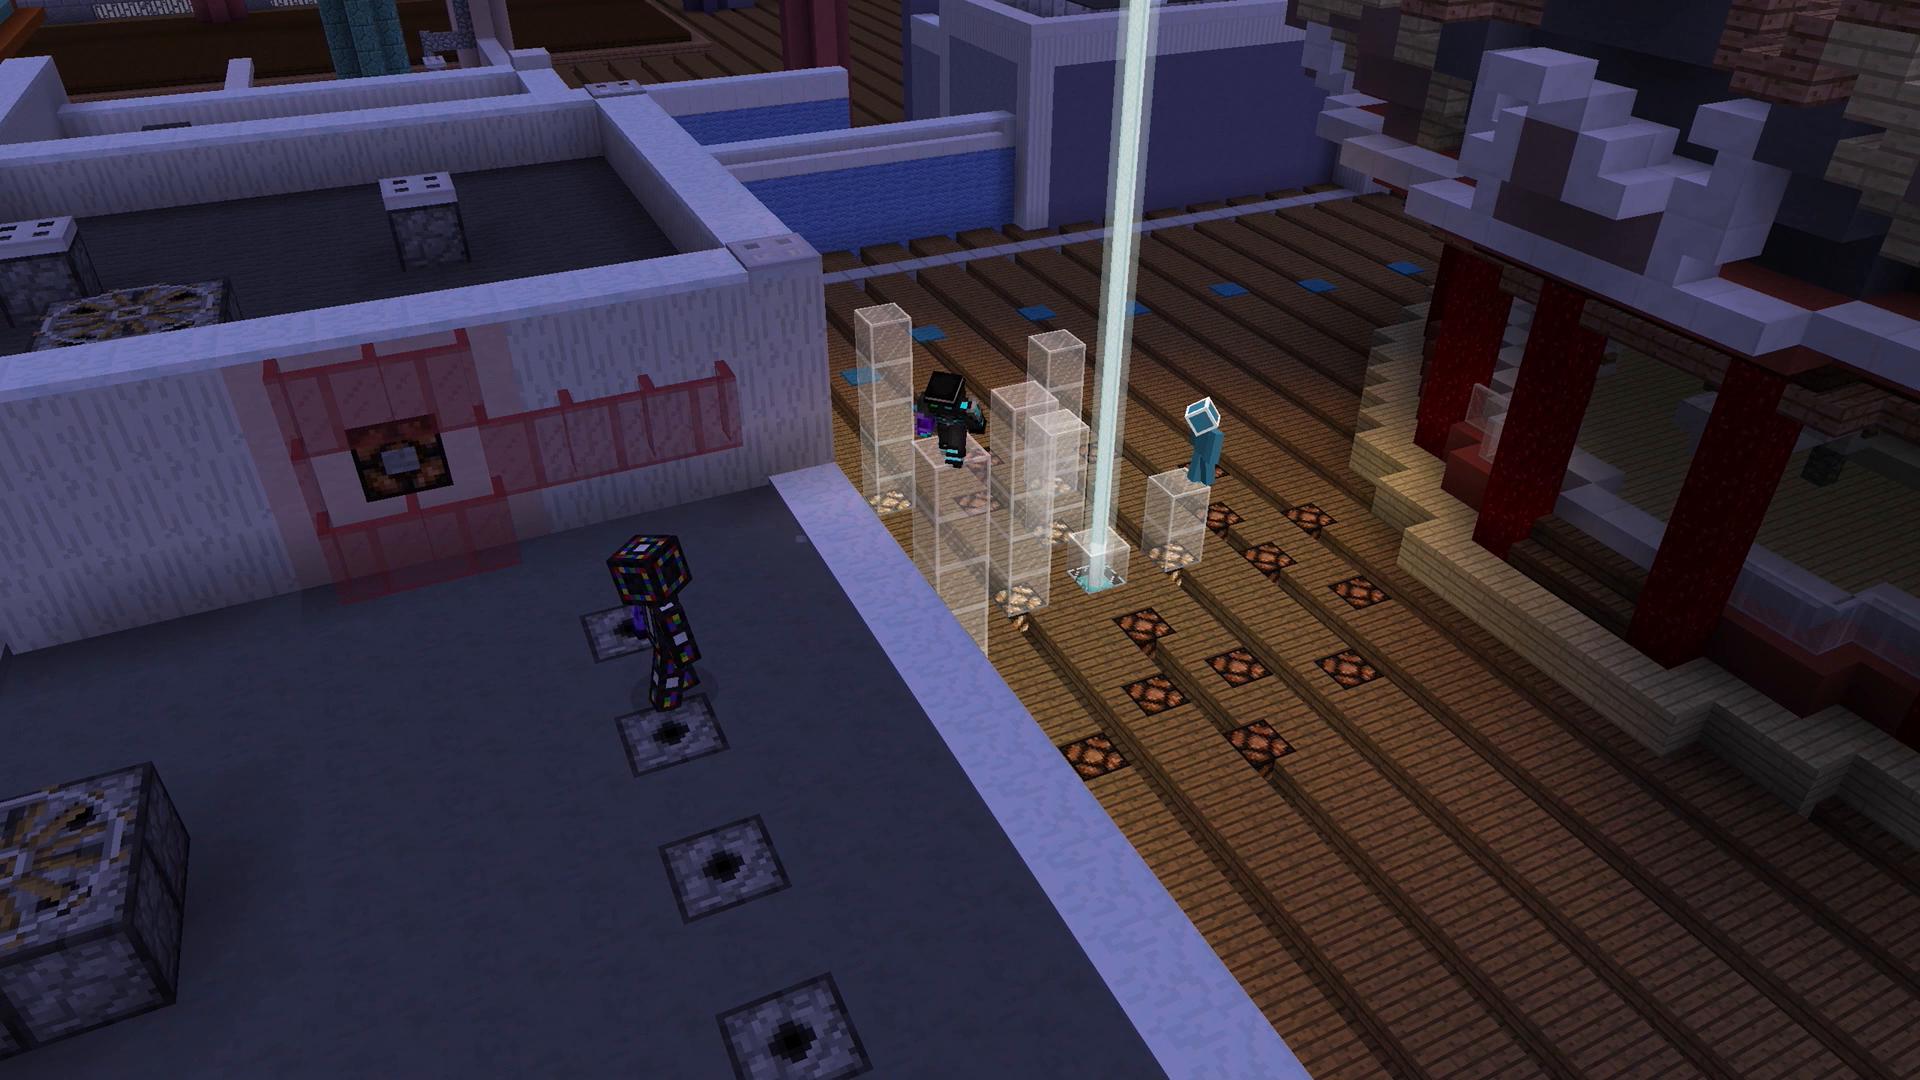 Thumbnail for #MinecraftIRL